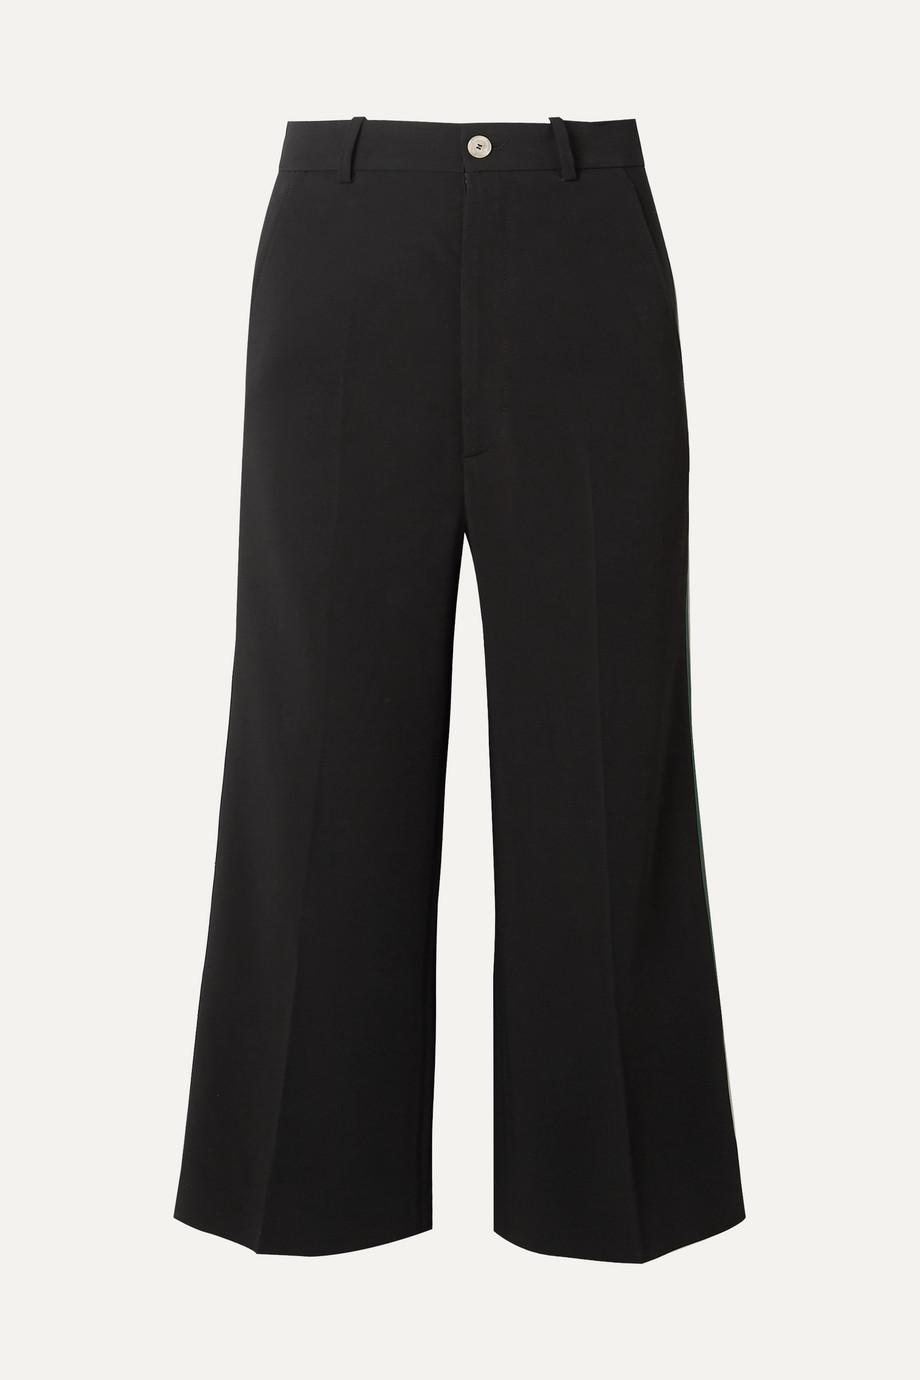 Gucci Striped cady wide-leg pants